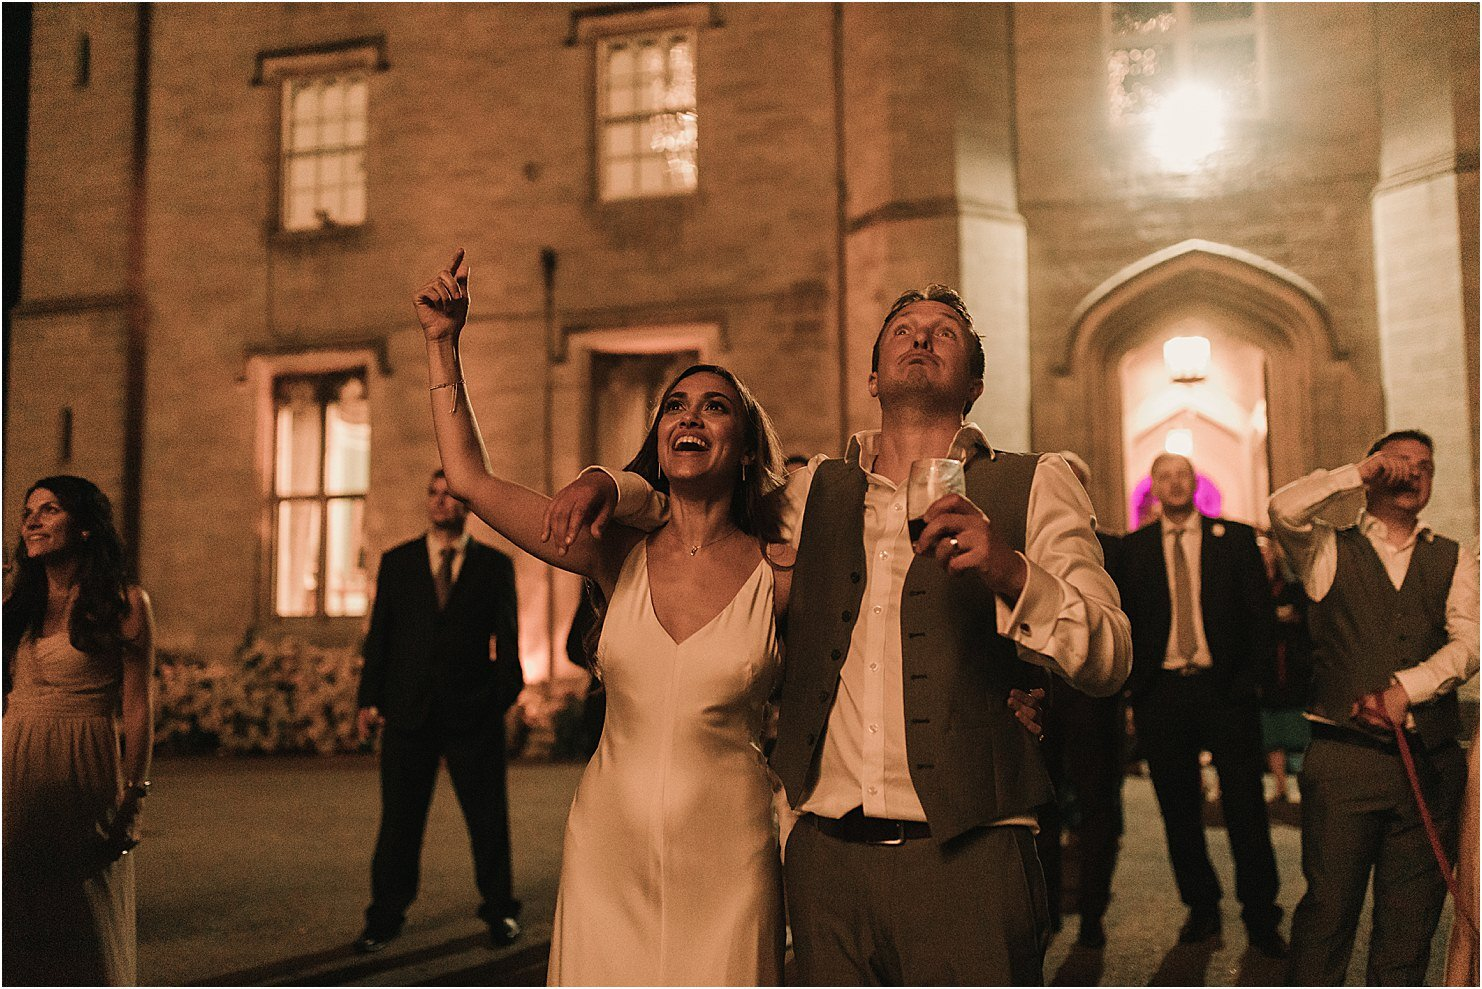 boda-de-cuento-en-castillo-boda-en-londres-91.jpg